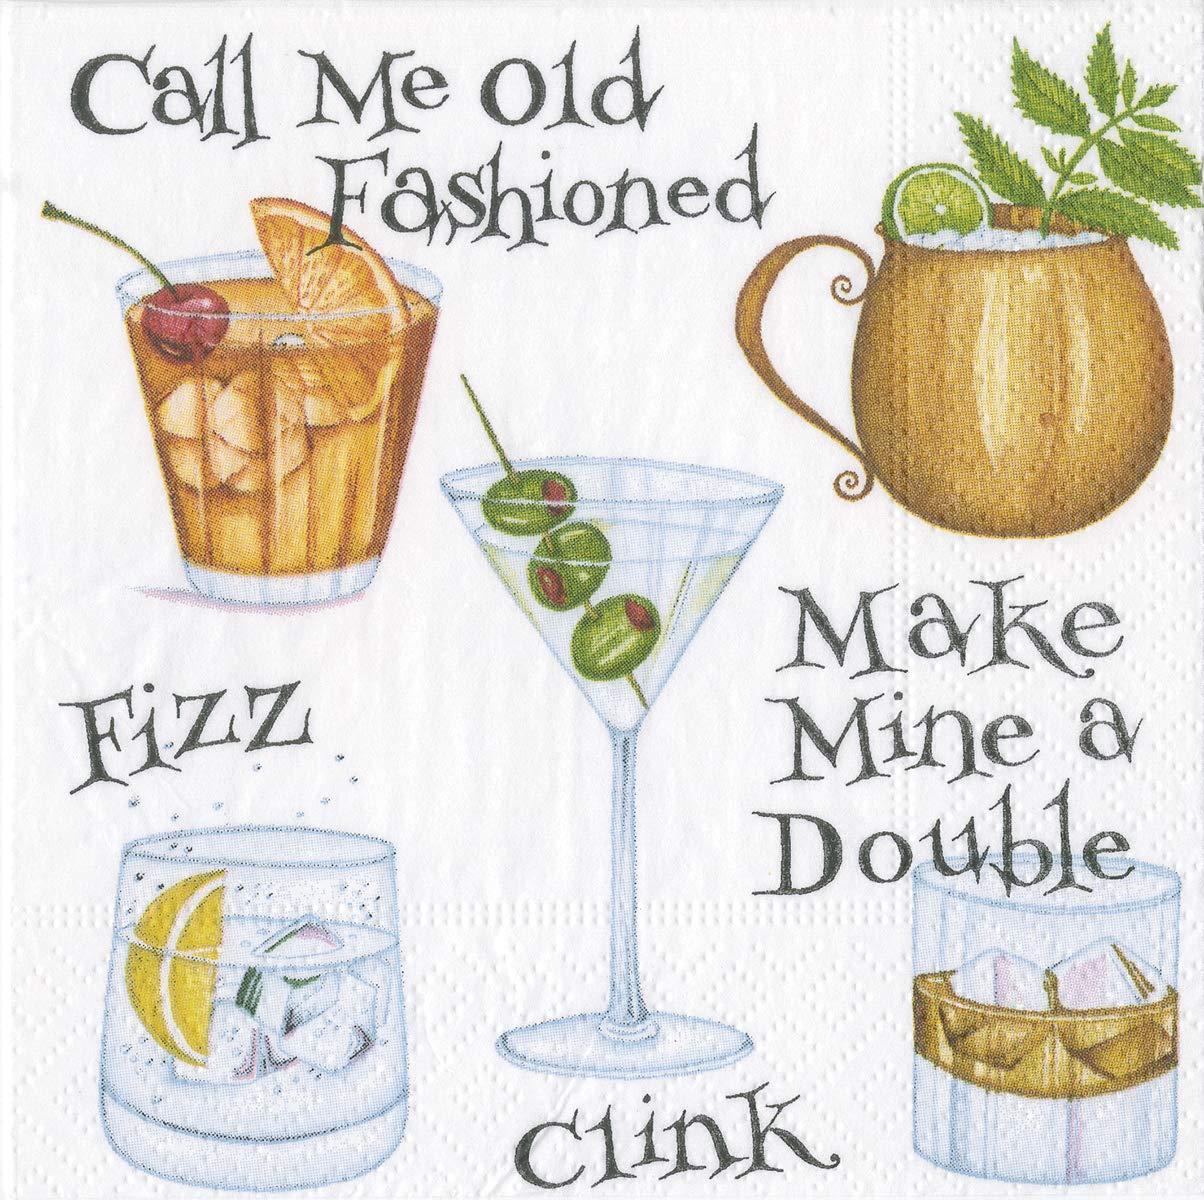 Caspari Funny Cocktail Napkins Paper Napkins 5 x 5 Party Napkins Beverage Decorative Happy Hour Ruby Slippers Pk 40